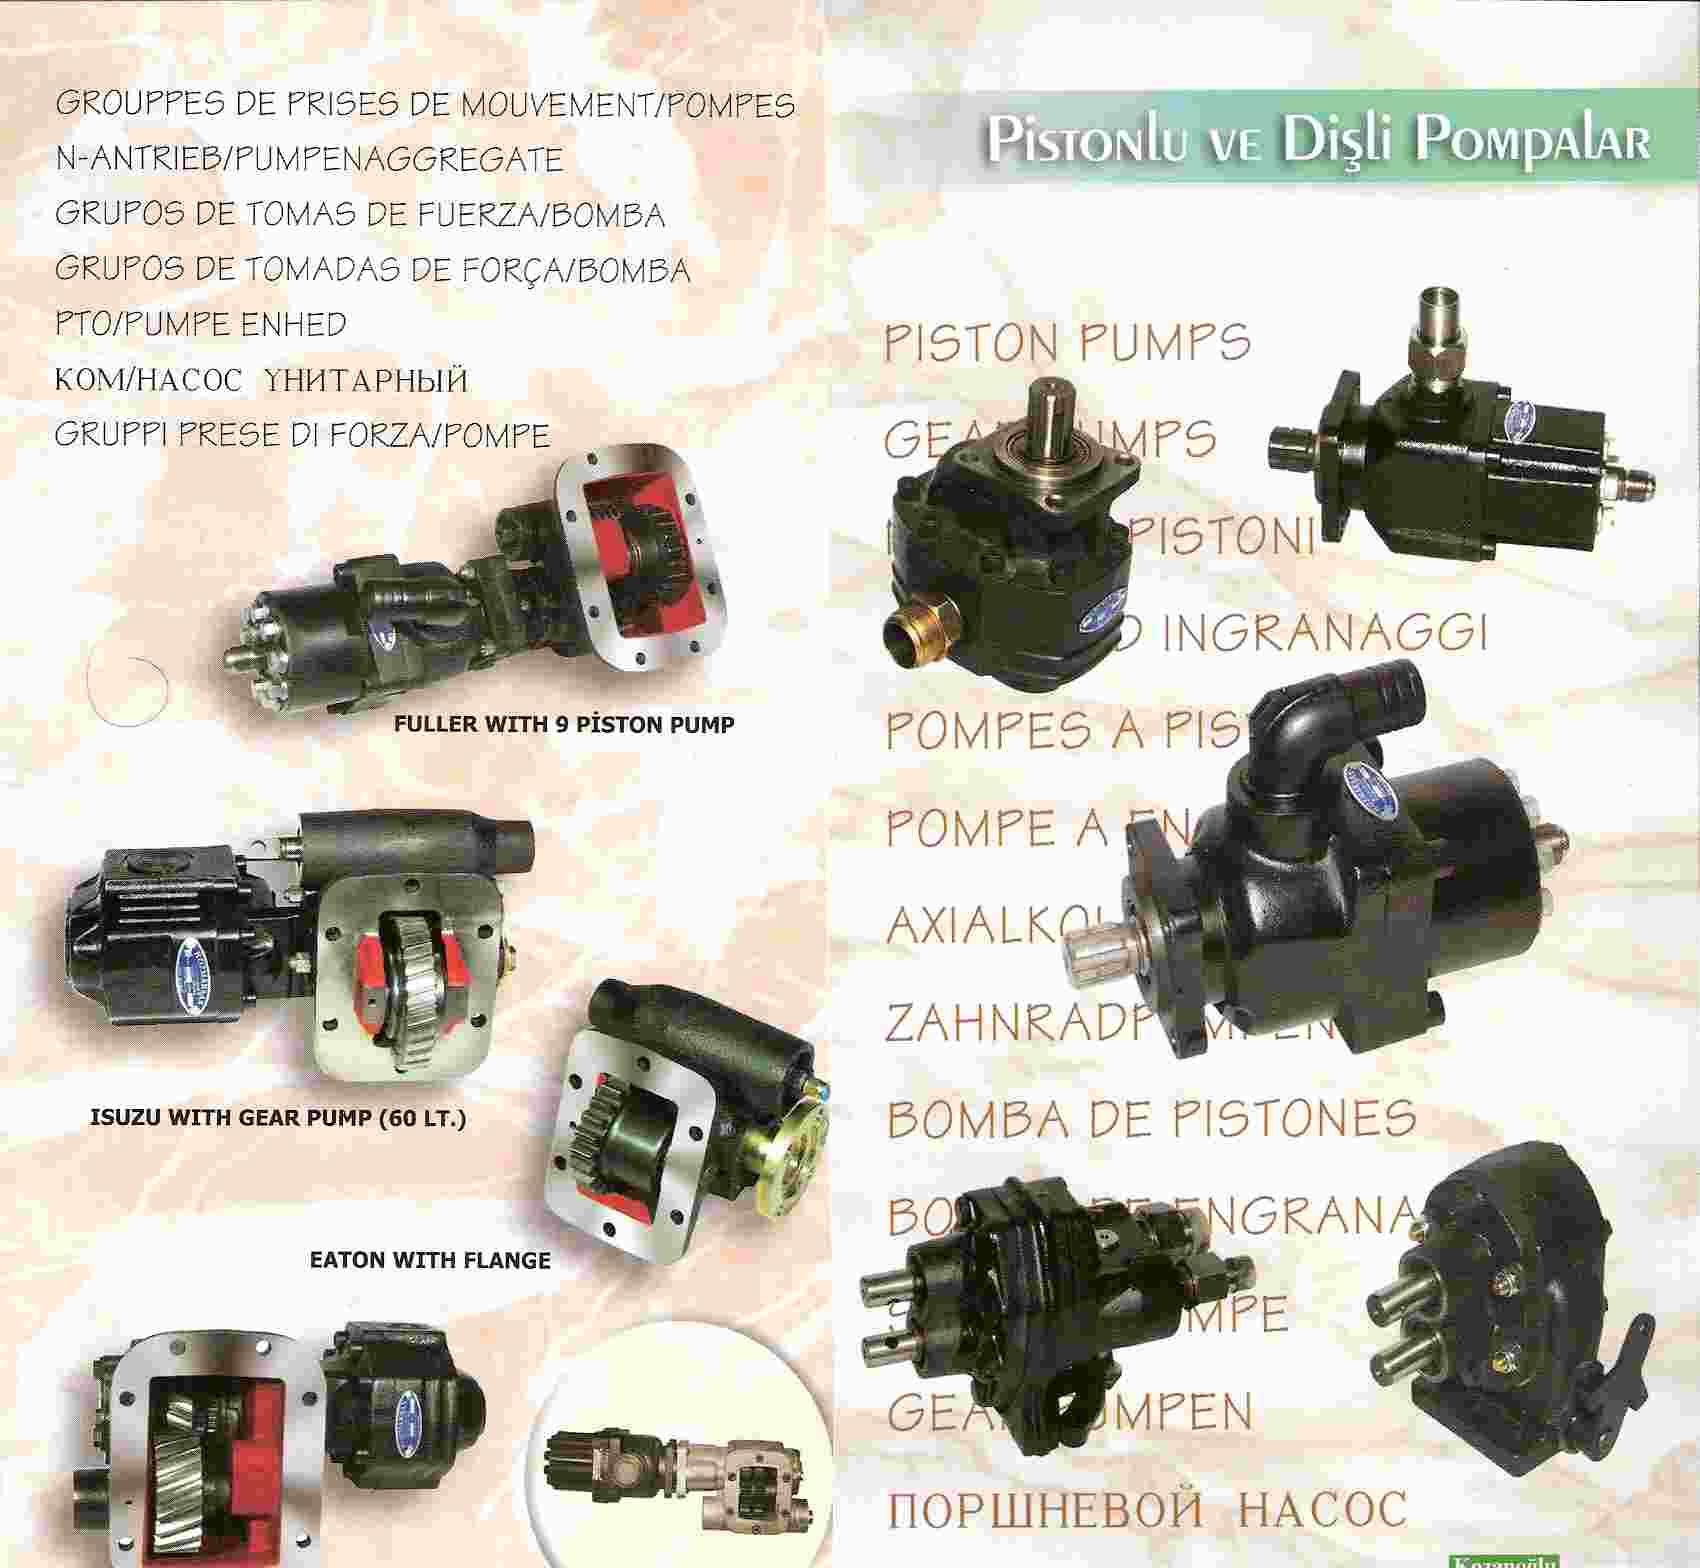 Power Take Off, Split Shaft Pto, Hydraulic Pump, PTO Shaft